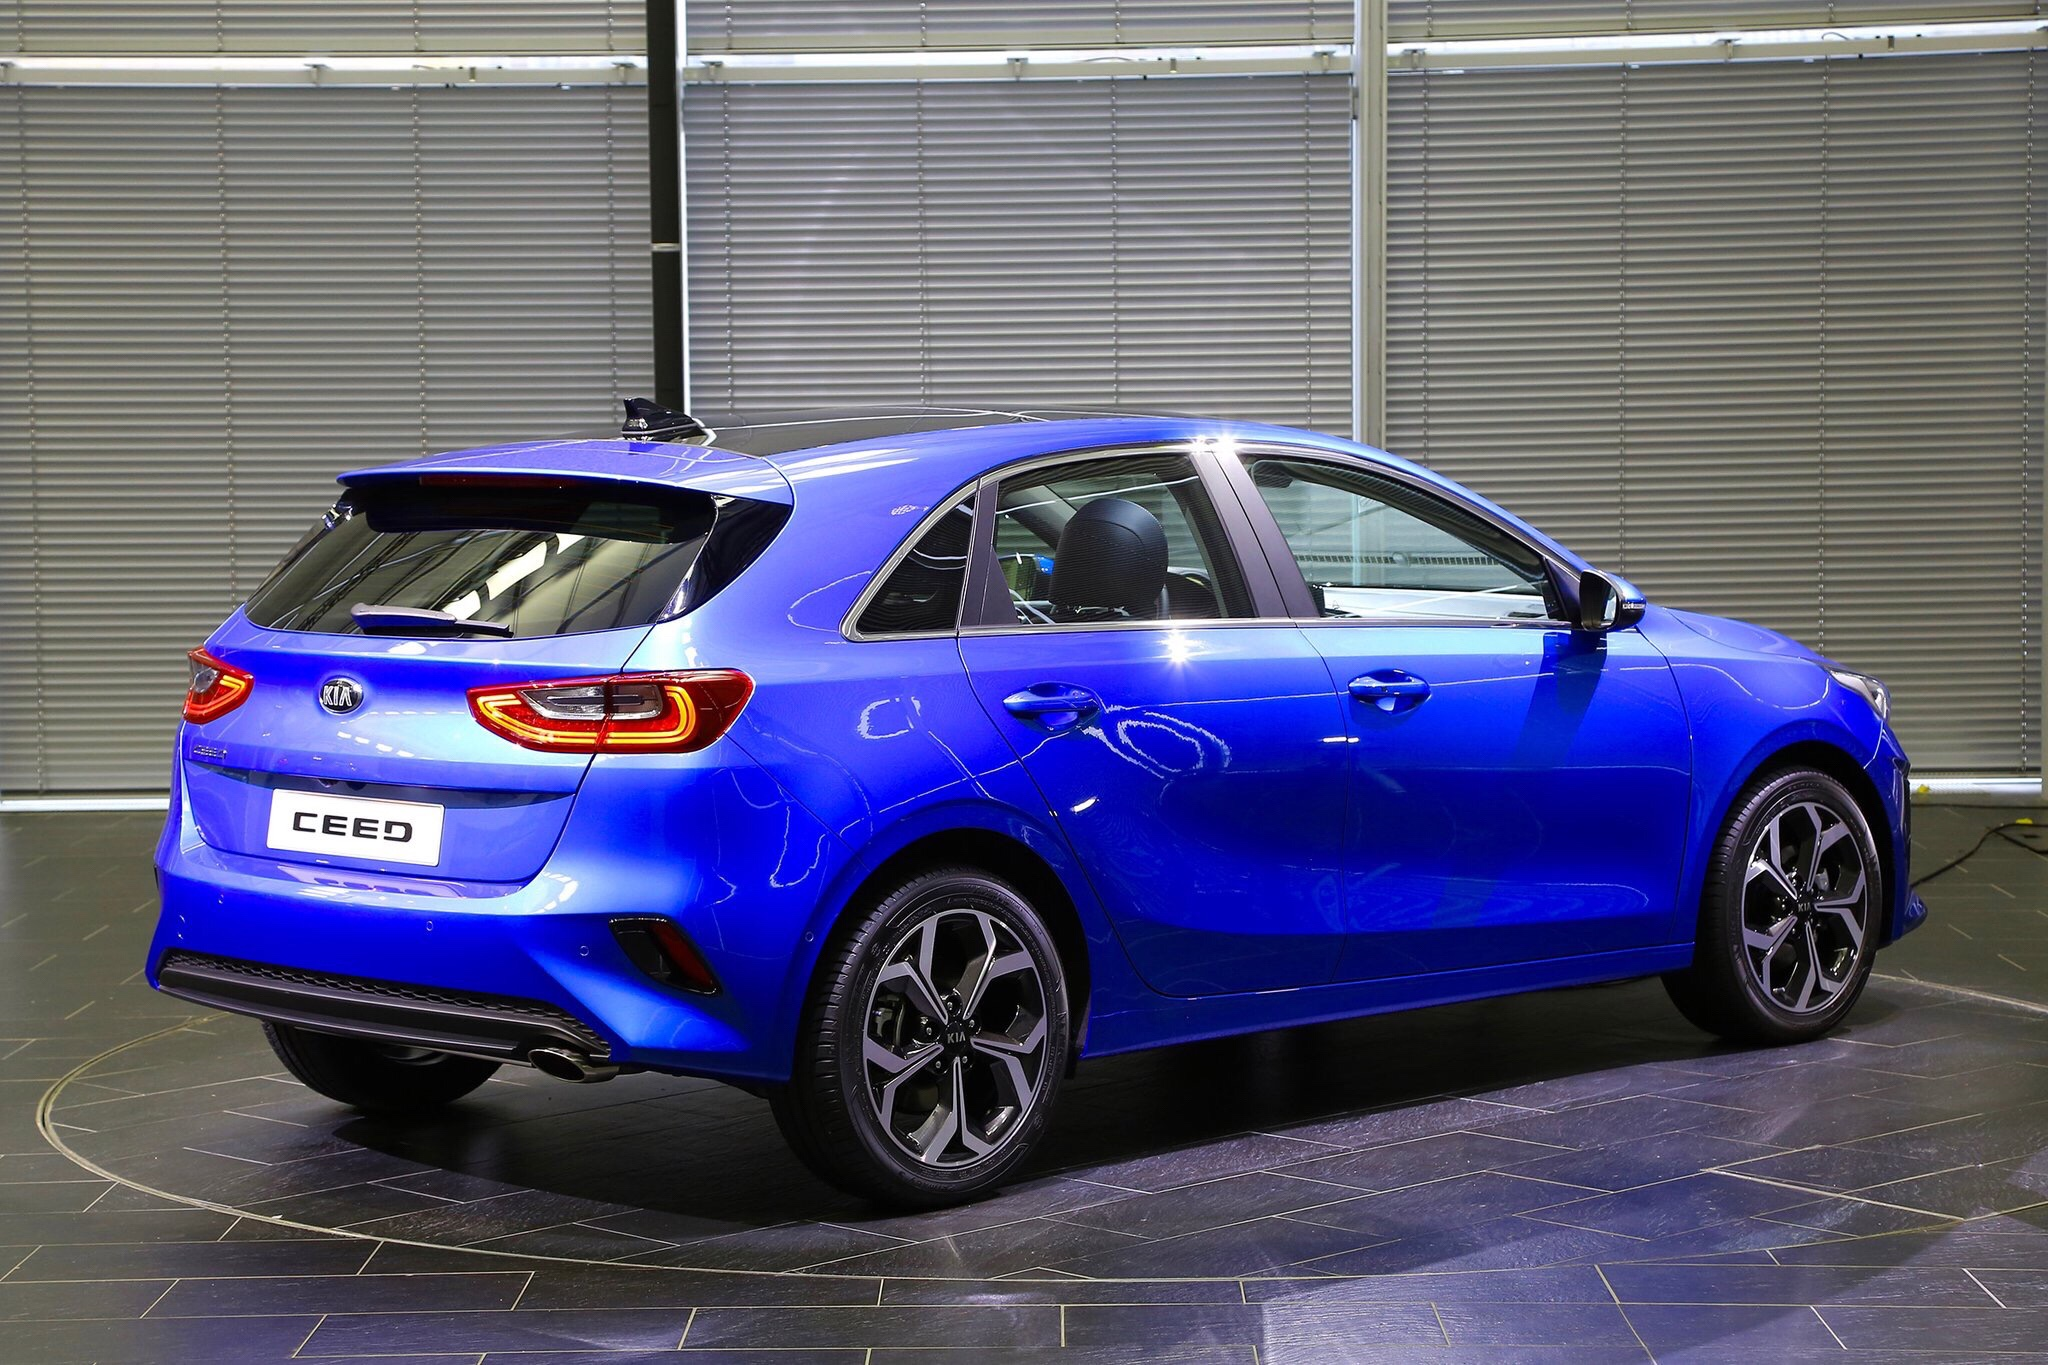 Kia Ceed 3rd Generation >> 3rd Generation Kia CEED Revealed - The Korean Car Blog